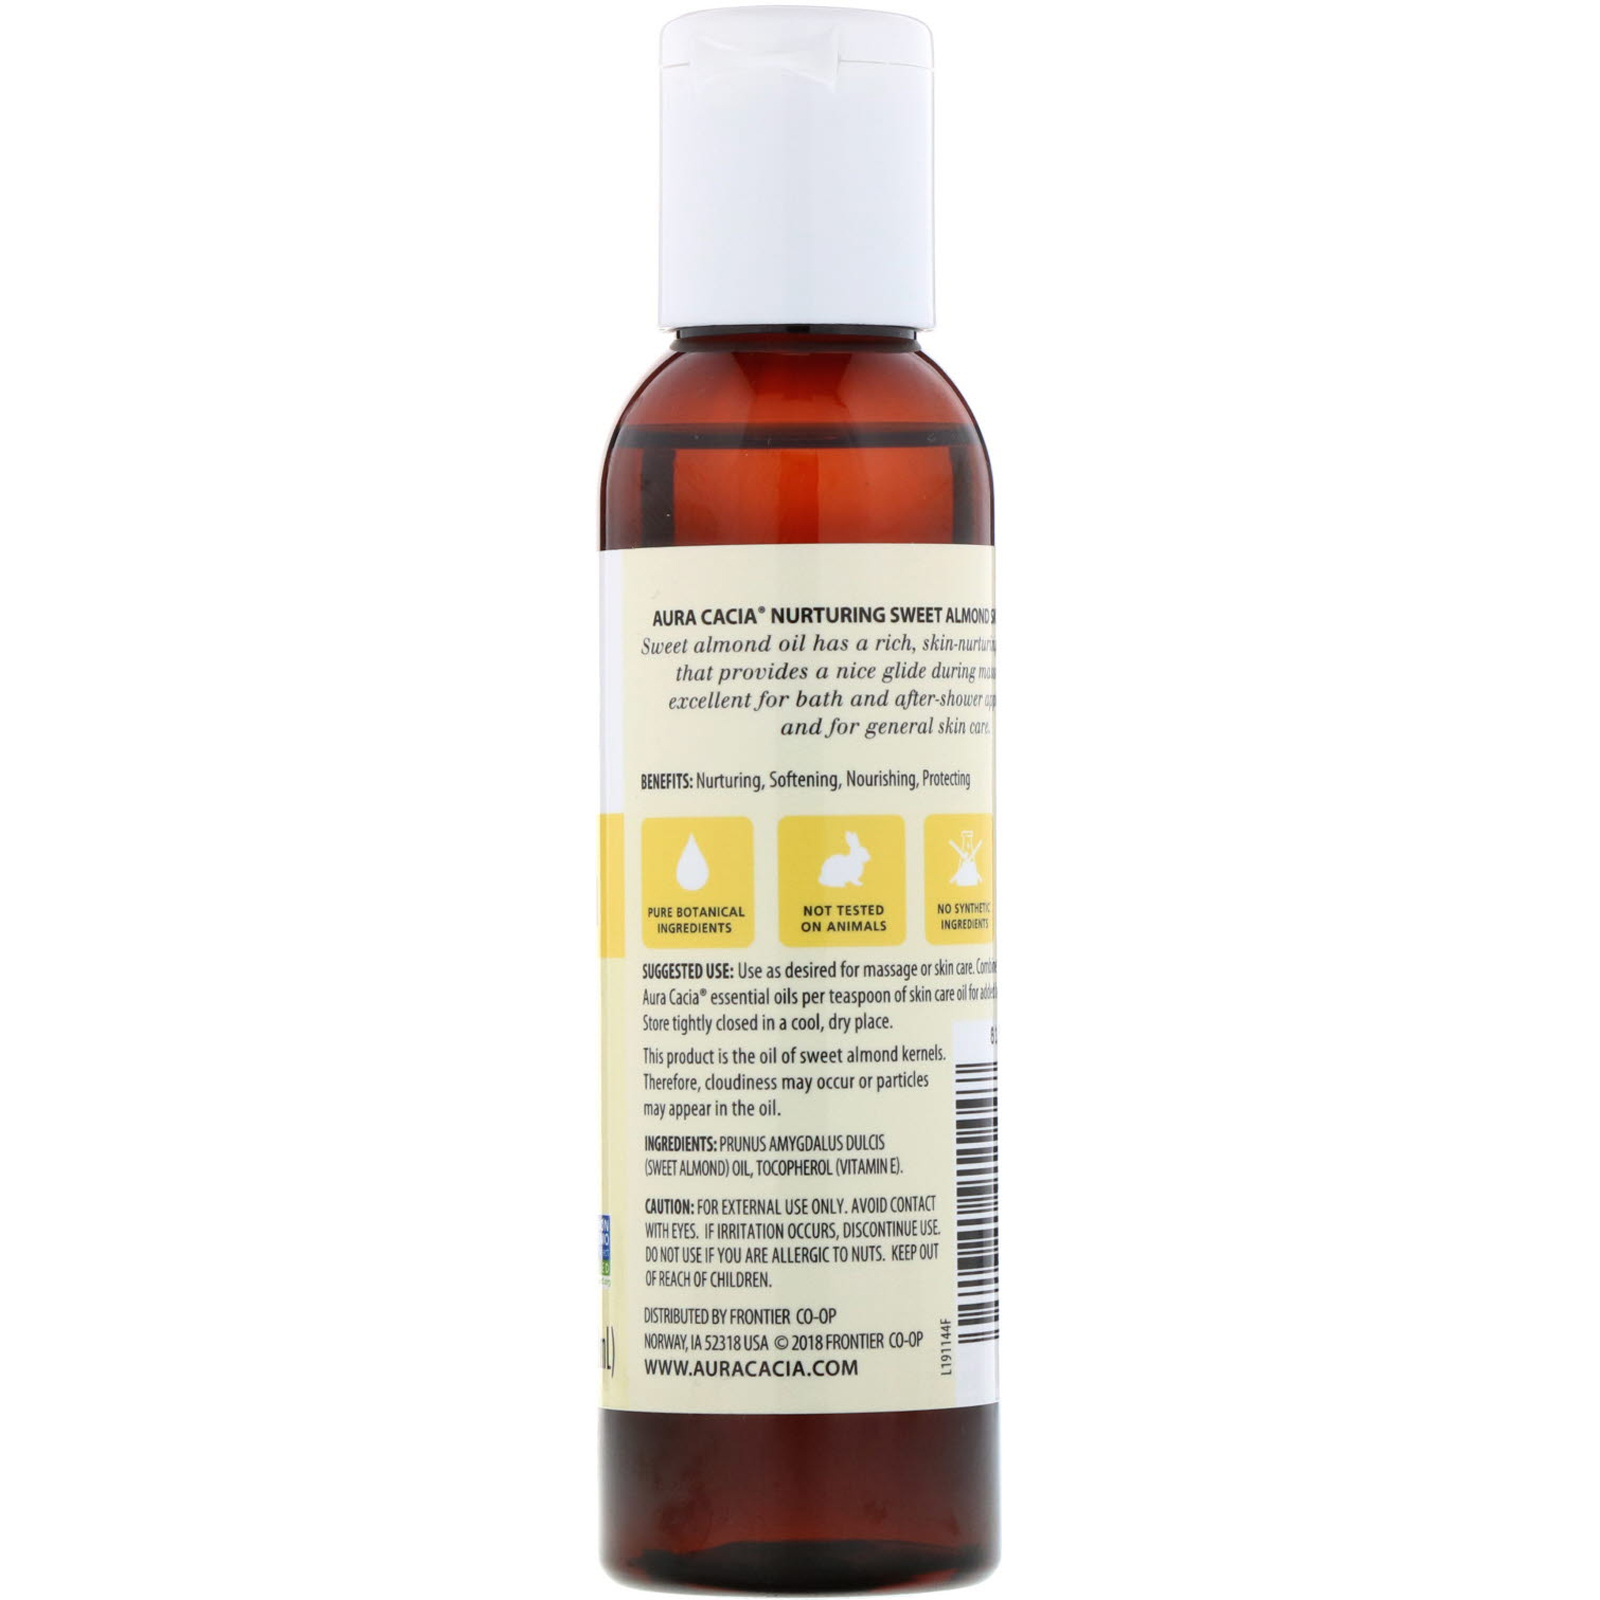 Aura Cacia, Skin Care Oil, Nurturing Sweet Almond, 4 fl oz